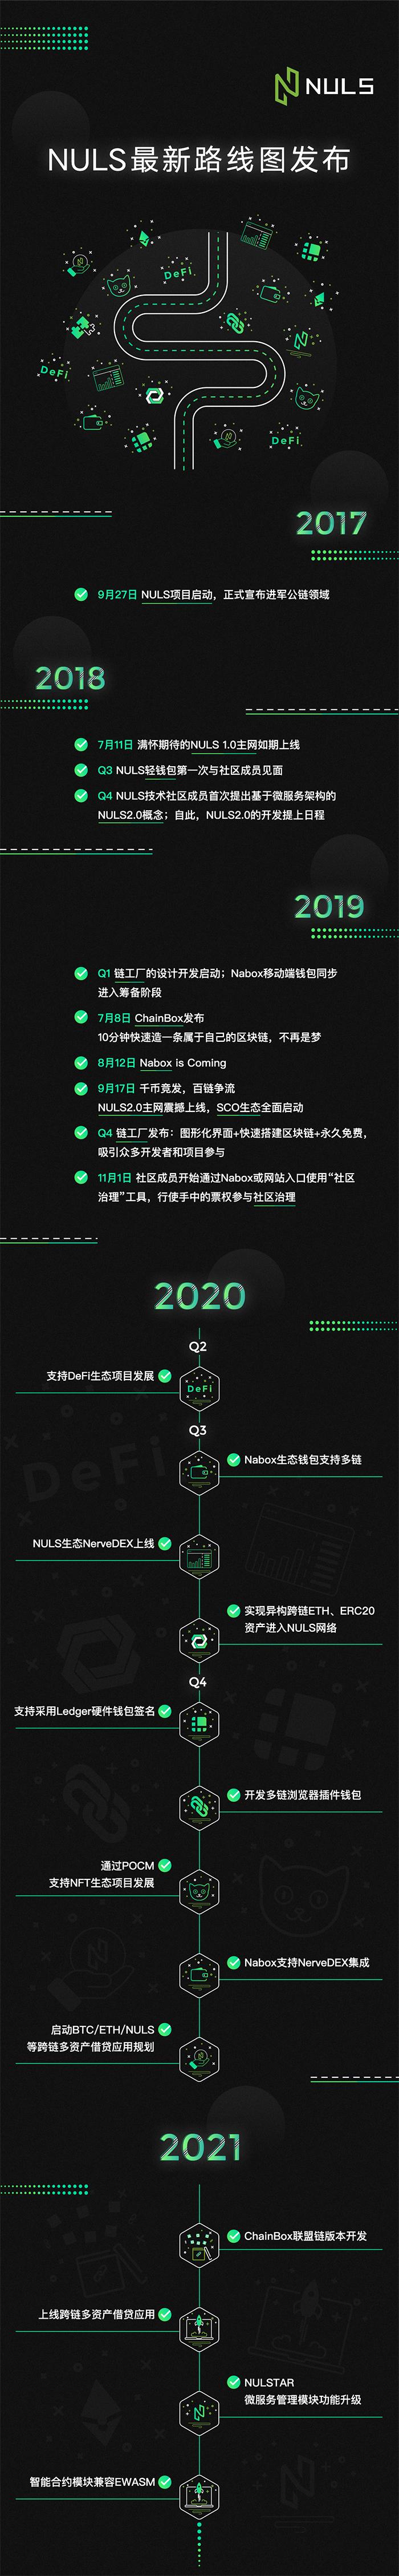 NULS Roadmap更新:将启动EWASM兼容计划